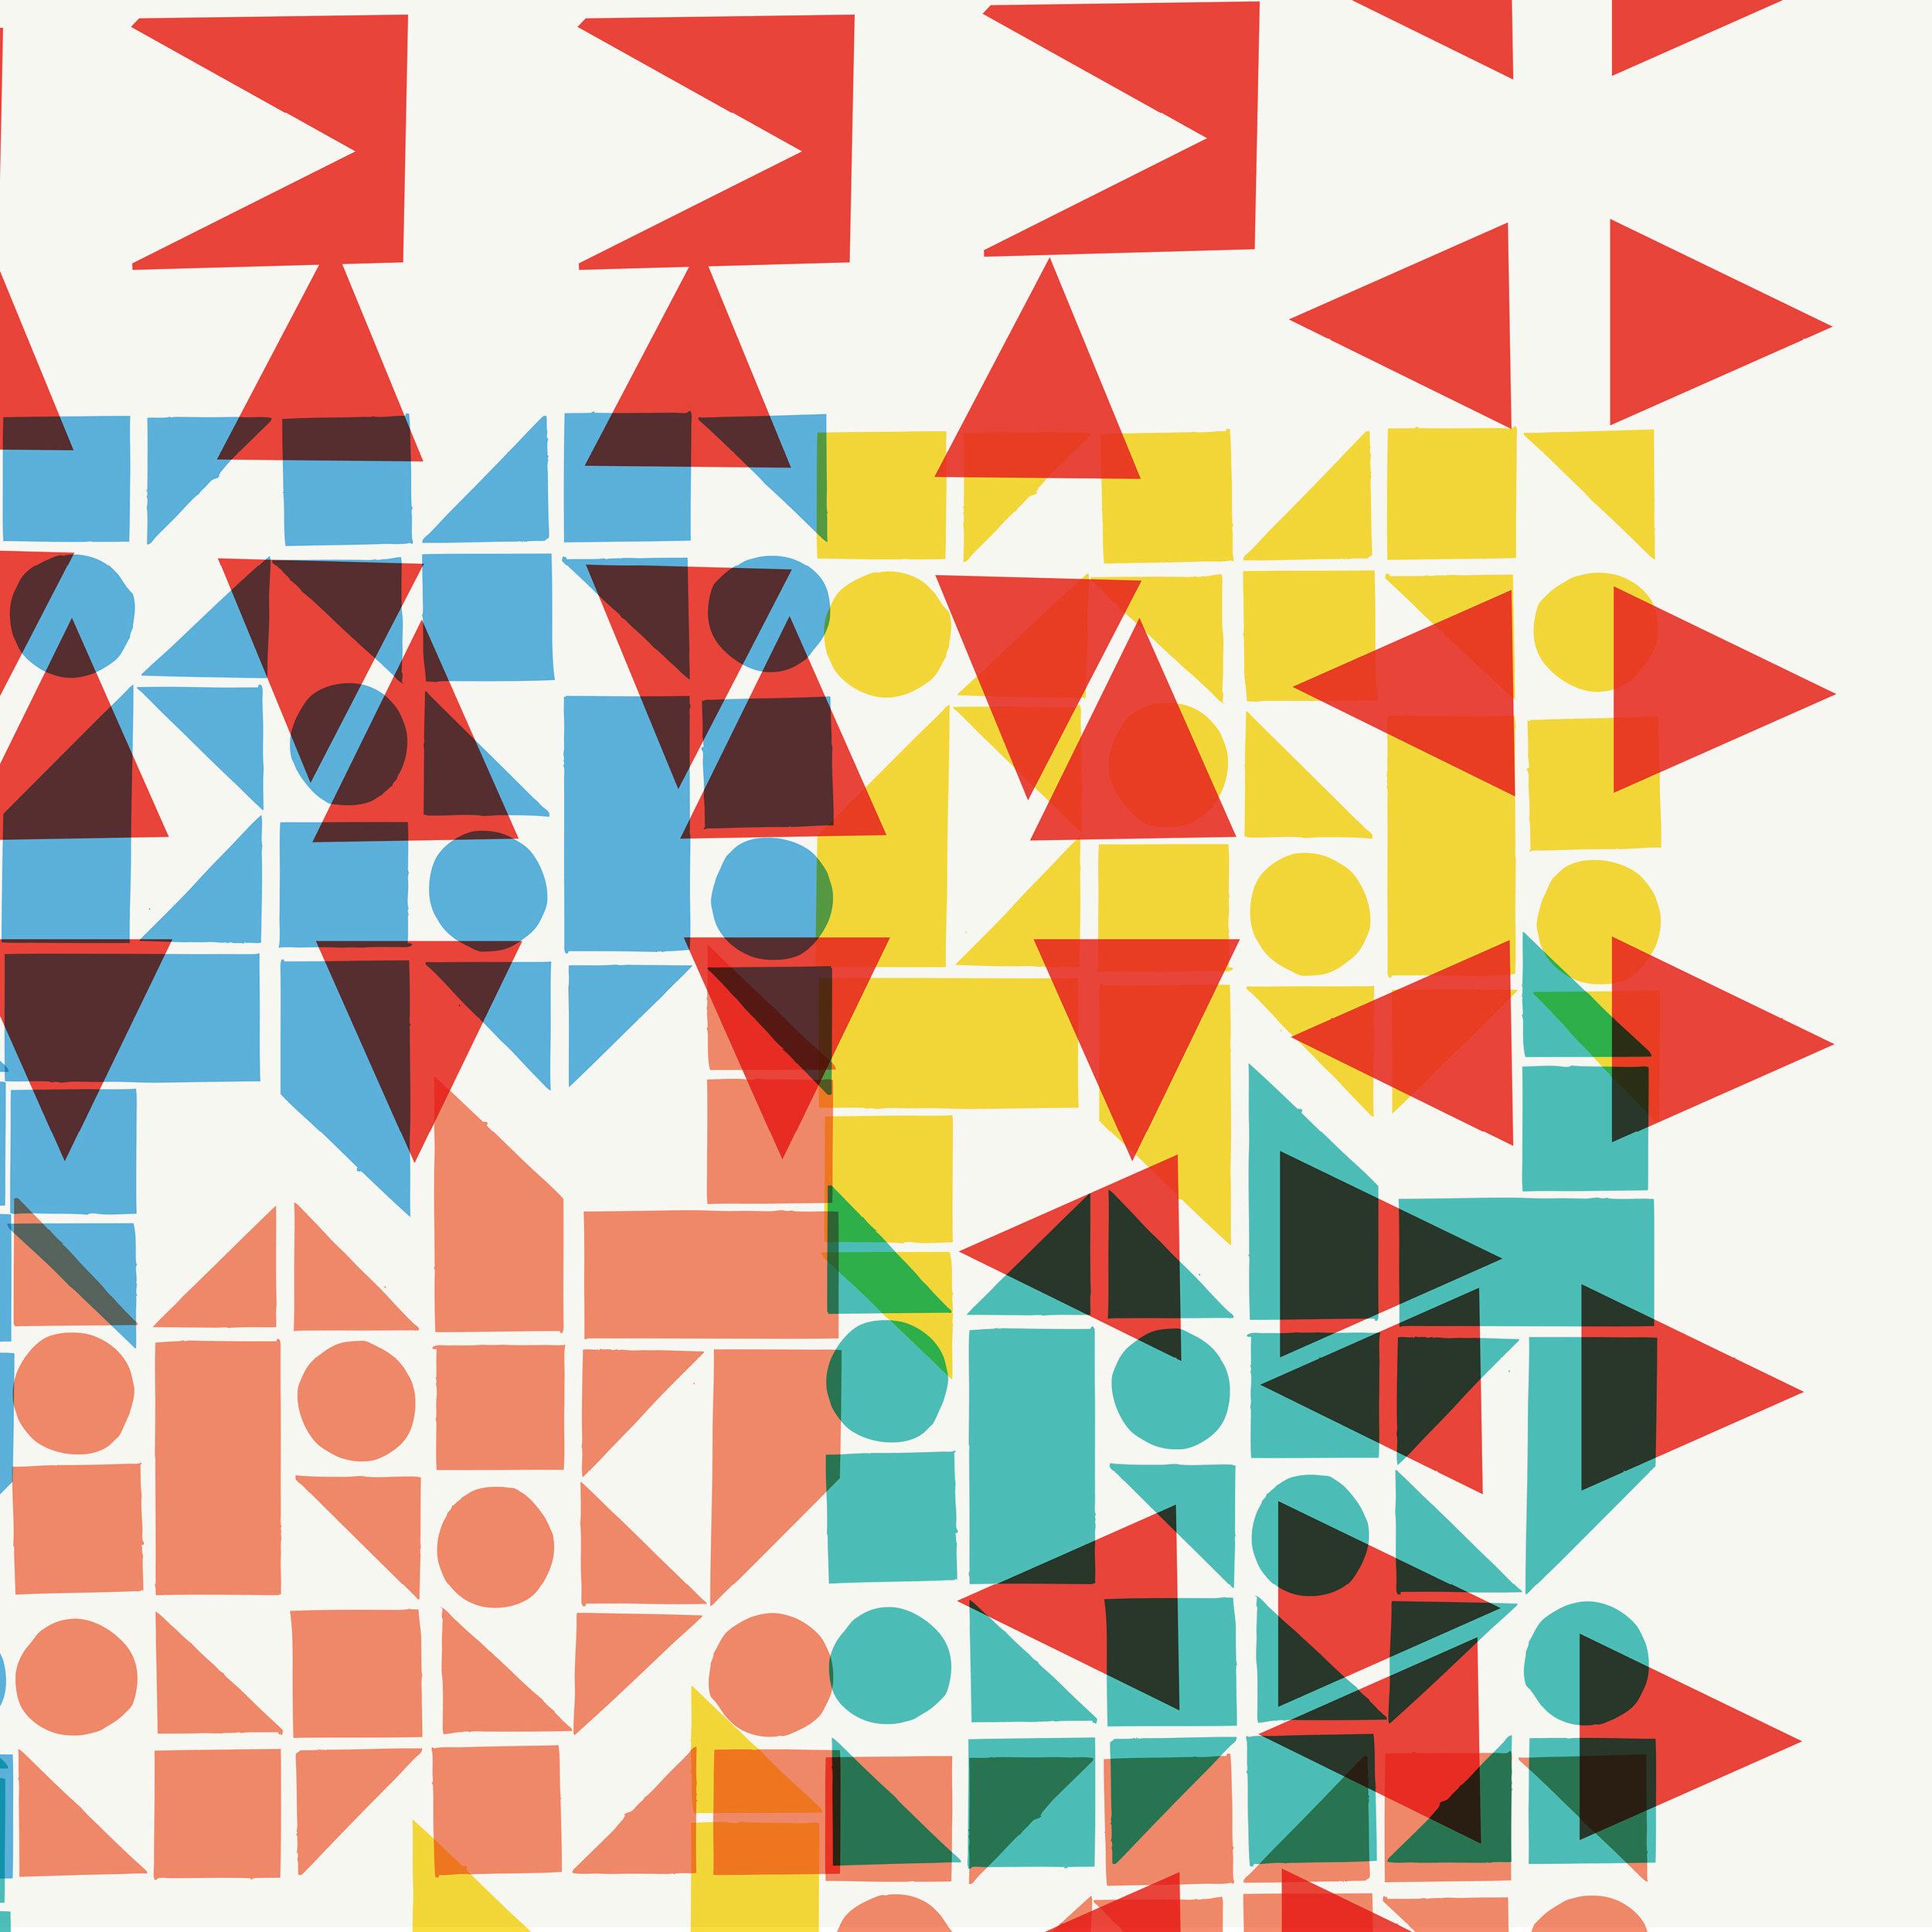 Marcus_Walters_Graniph_Pattern-3_WEB.jpg